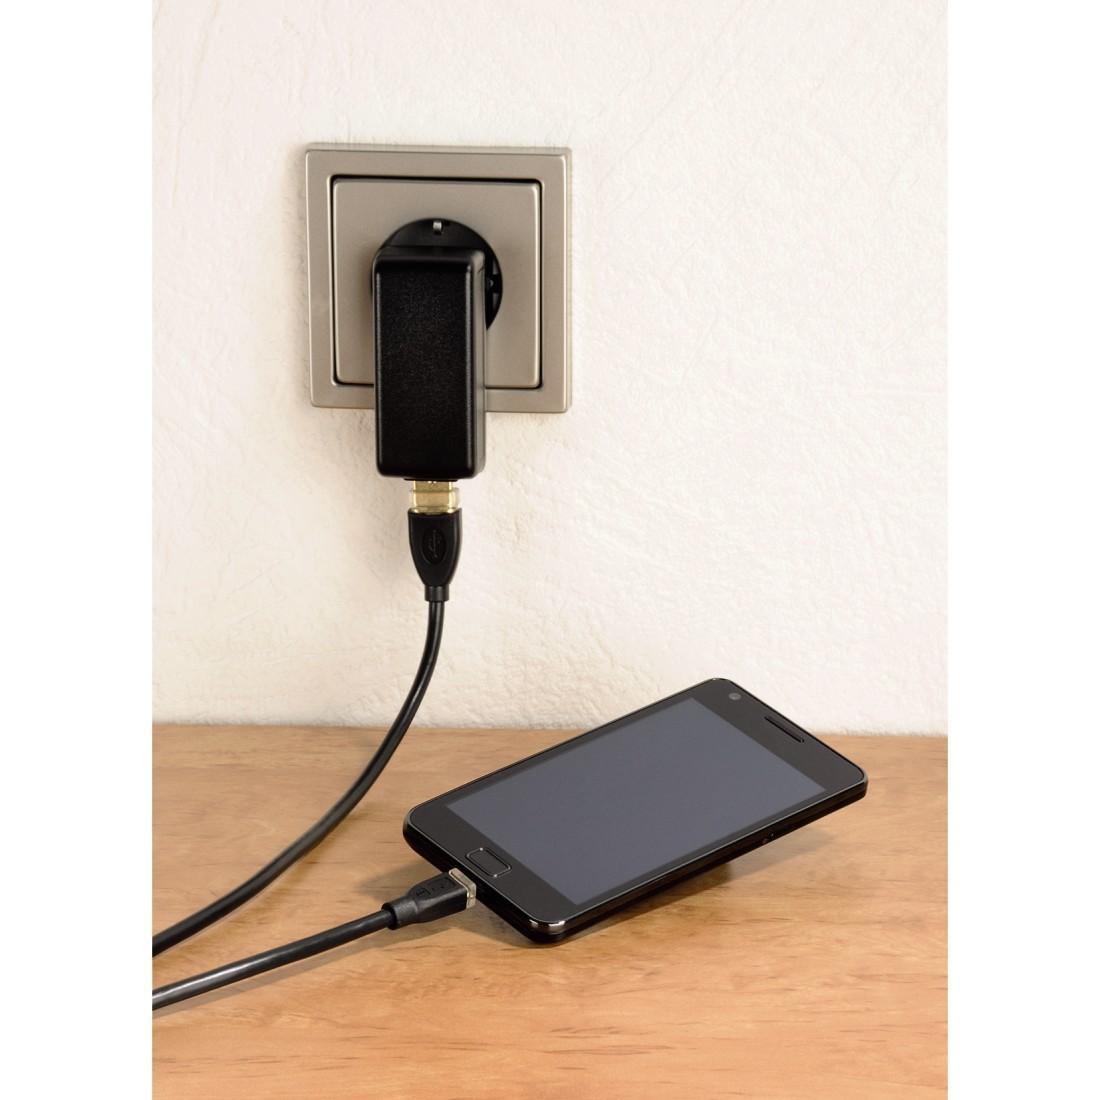 Кабел HAMA 78490 Micro USB 2.0, Позлатени конектори, 0.75 м., Черен